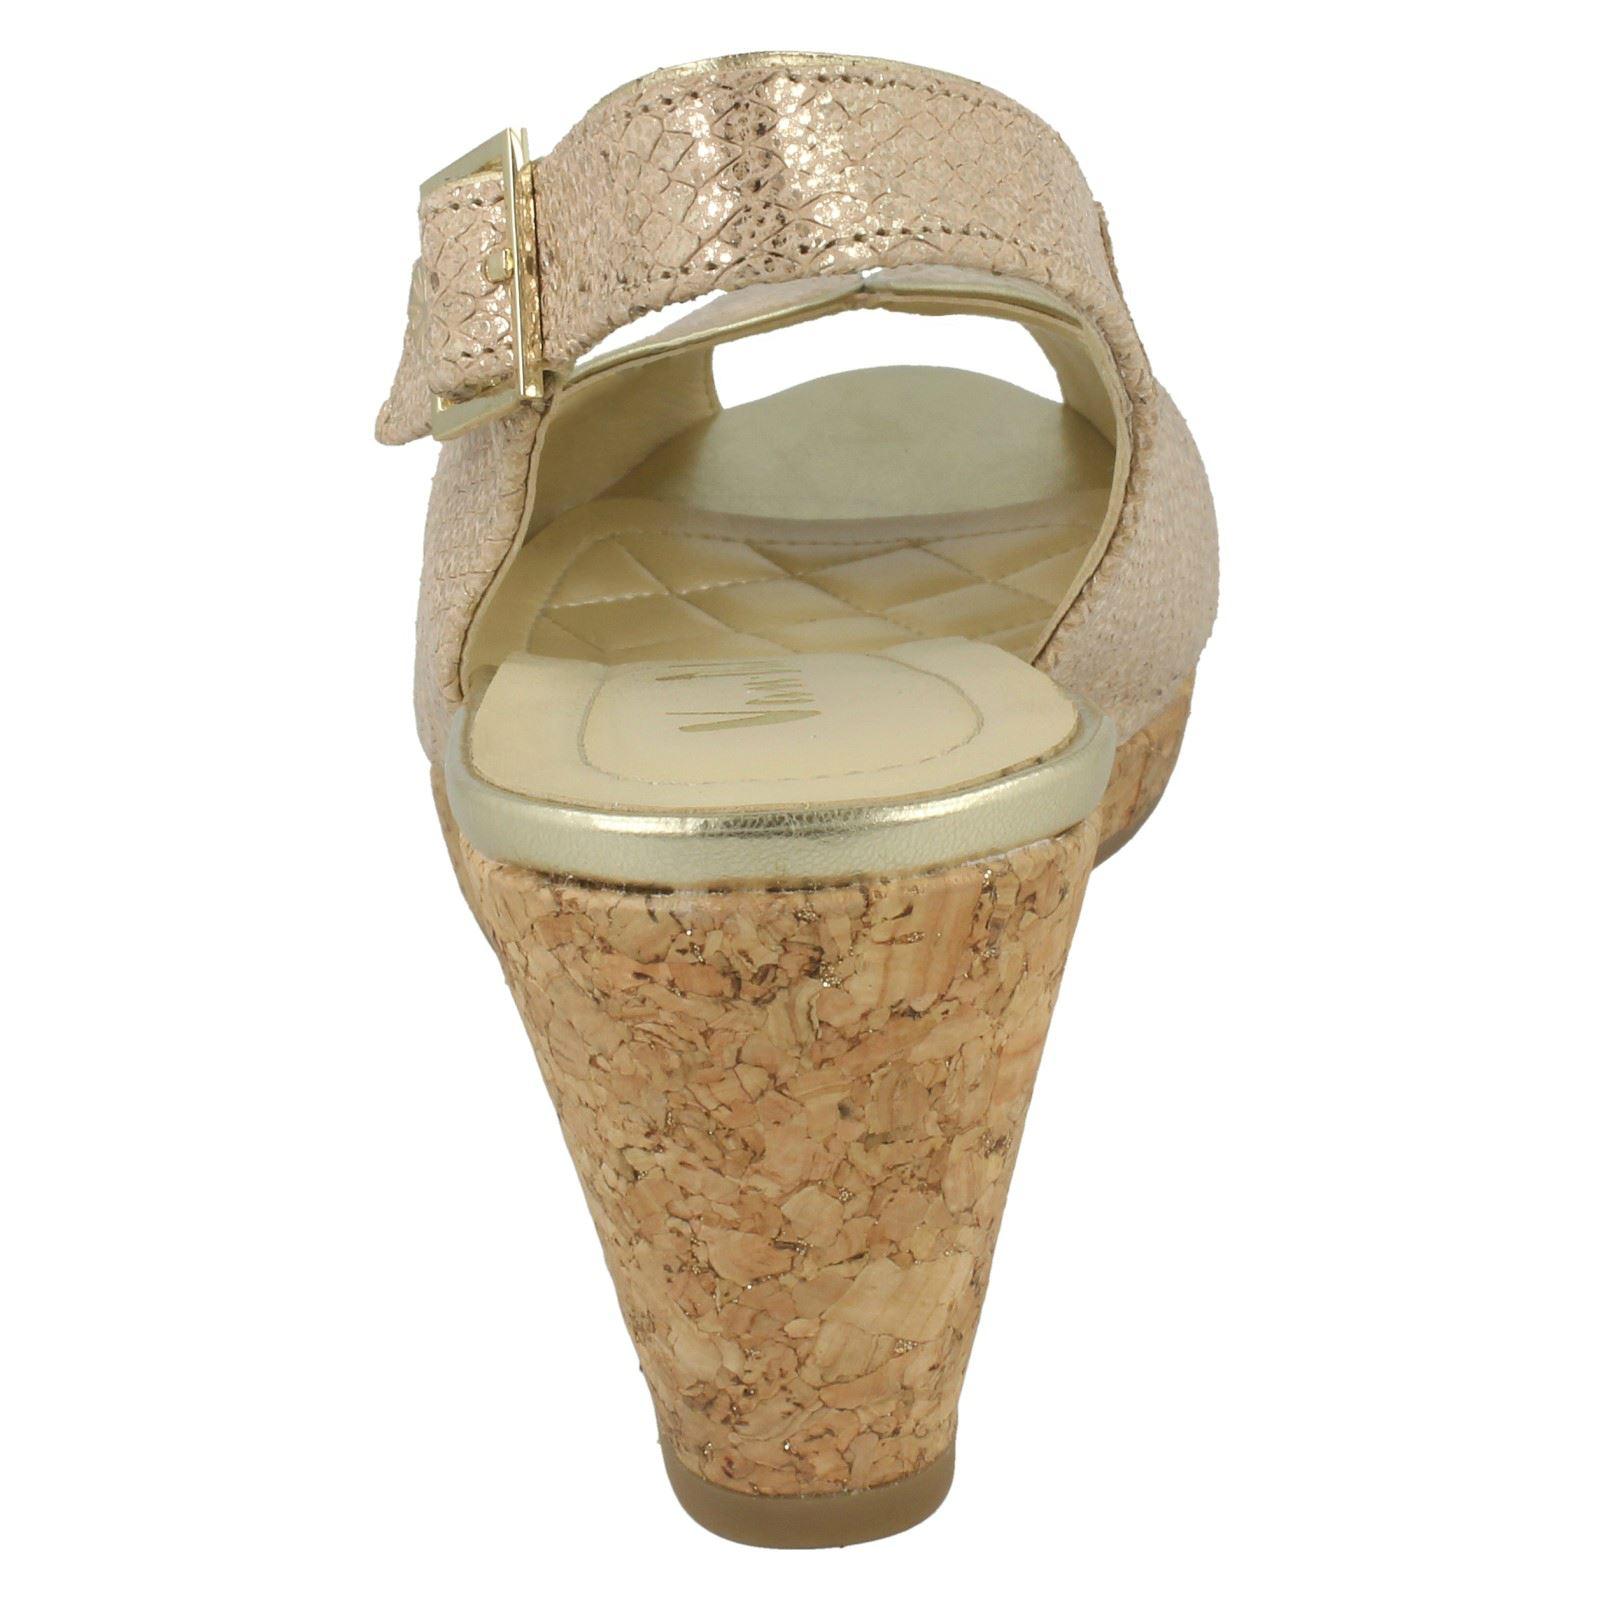 Ladies-Van-Dal-Cork-Wedge-Sandals-039-Gable-039 thumbnail 4